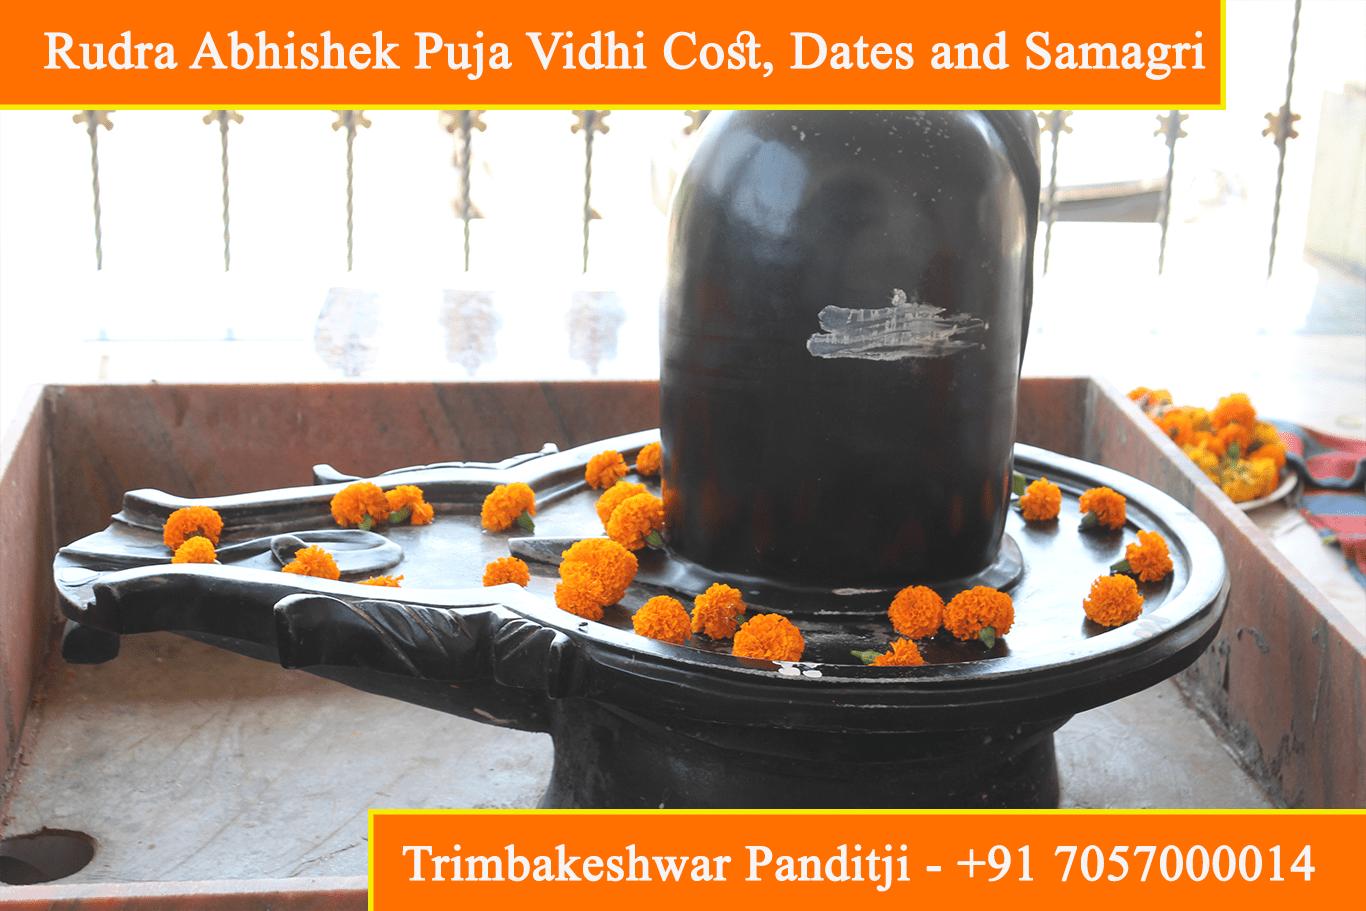 Rudra Abhishek Puja Vidhi, Cost, Dates, Samagri, Benefits And Mantra